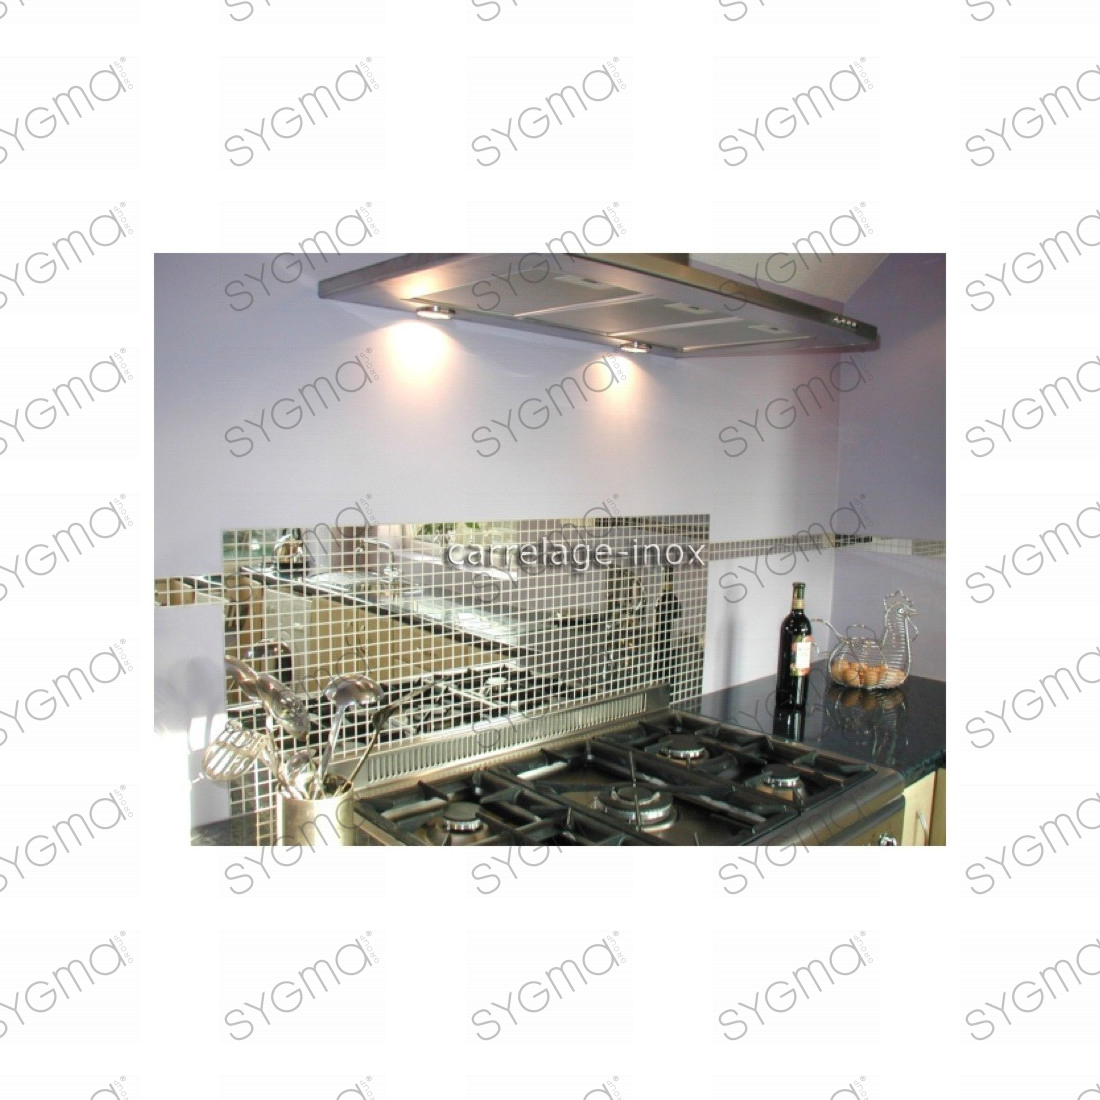 Carrelage inox miroir 1 m2 mosaique faience miroir 30 for Faience inox cuisine